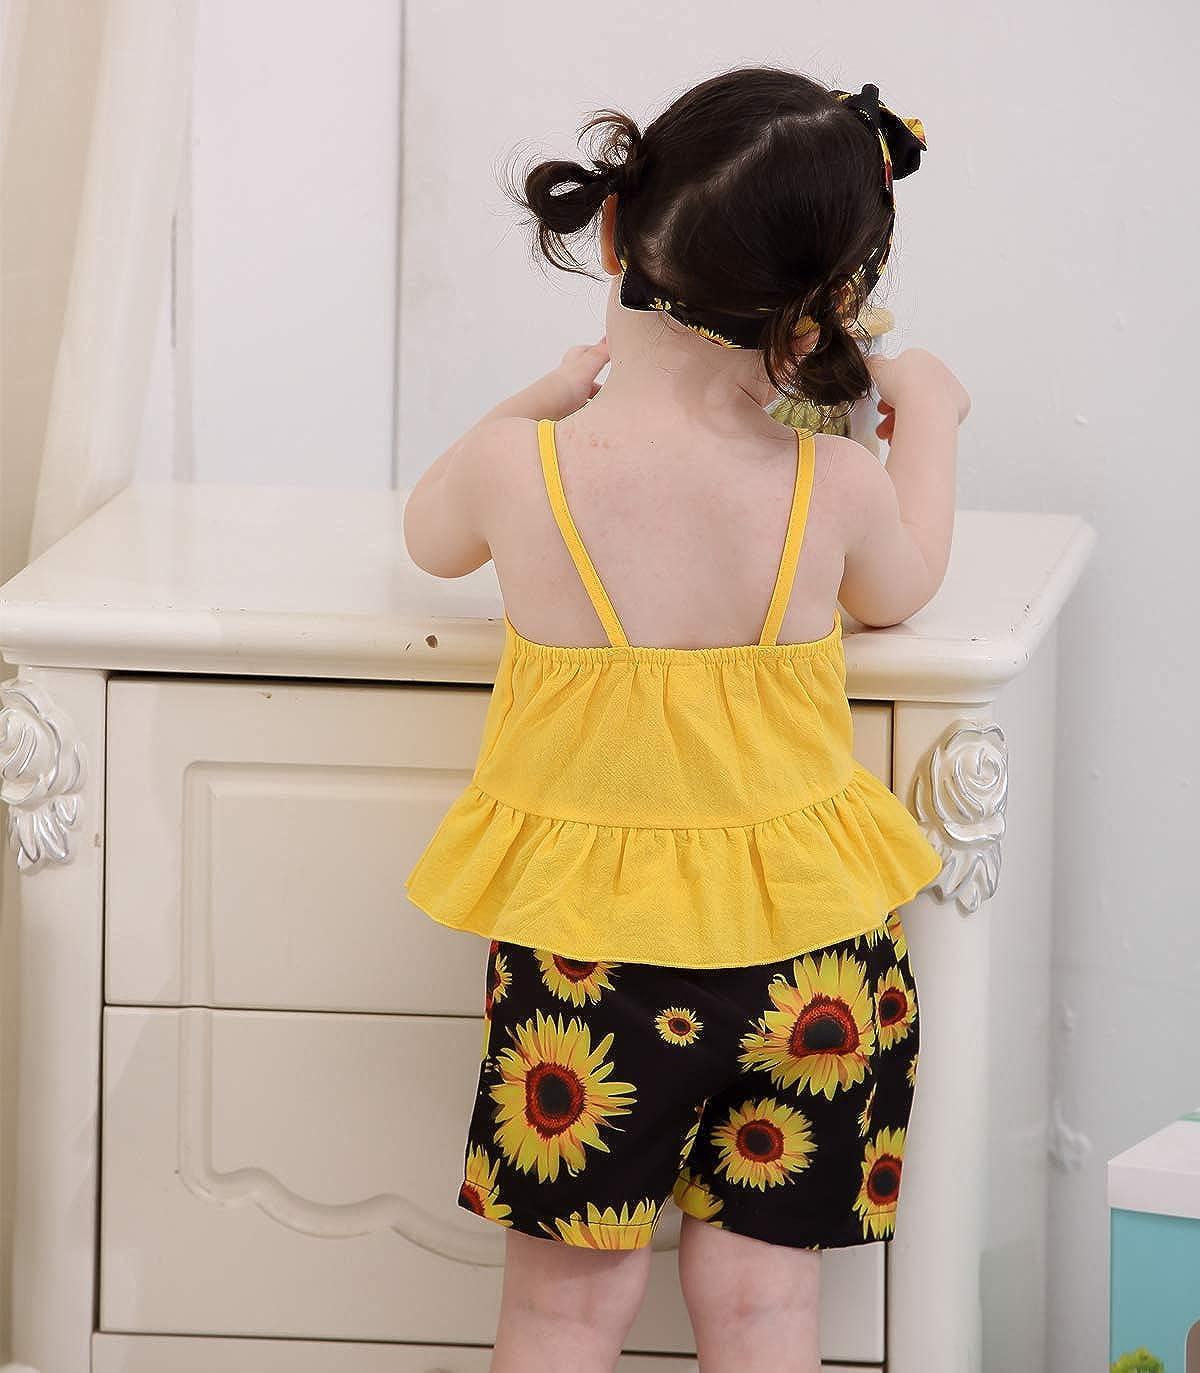 Kucnuzki Toddler Baby Girl Clothes Summer Outfits Ruffle Sleeveless Linen Shirt Kid Short Set for Girl